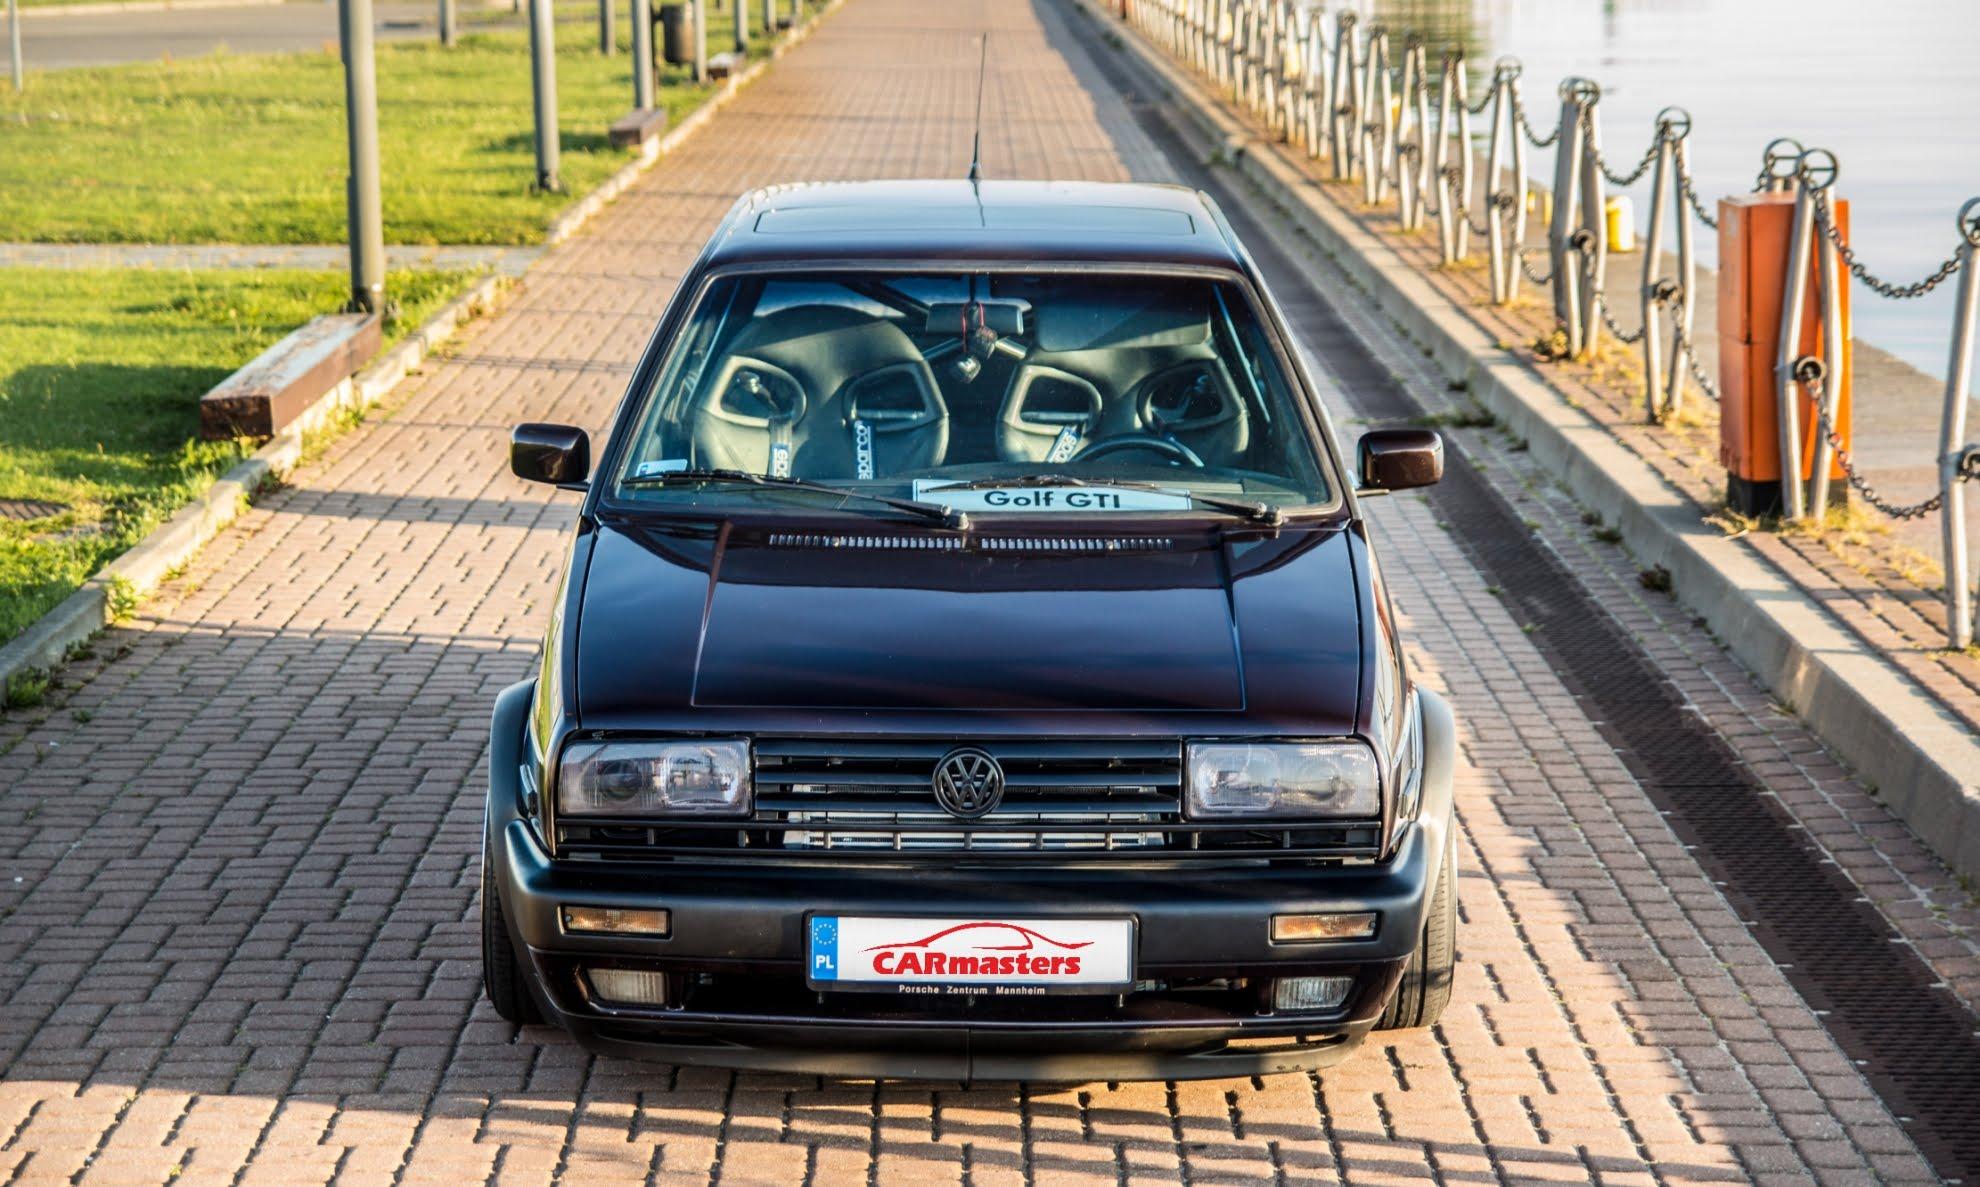 DLEDMV golf VR6 turbo carmasters 03